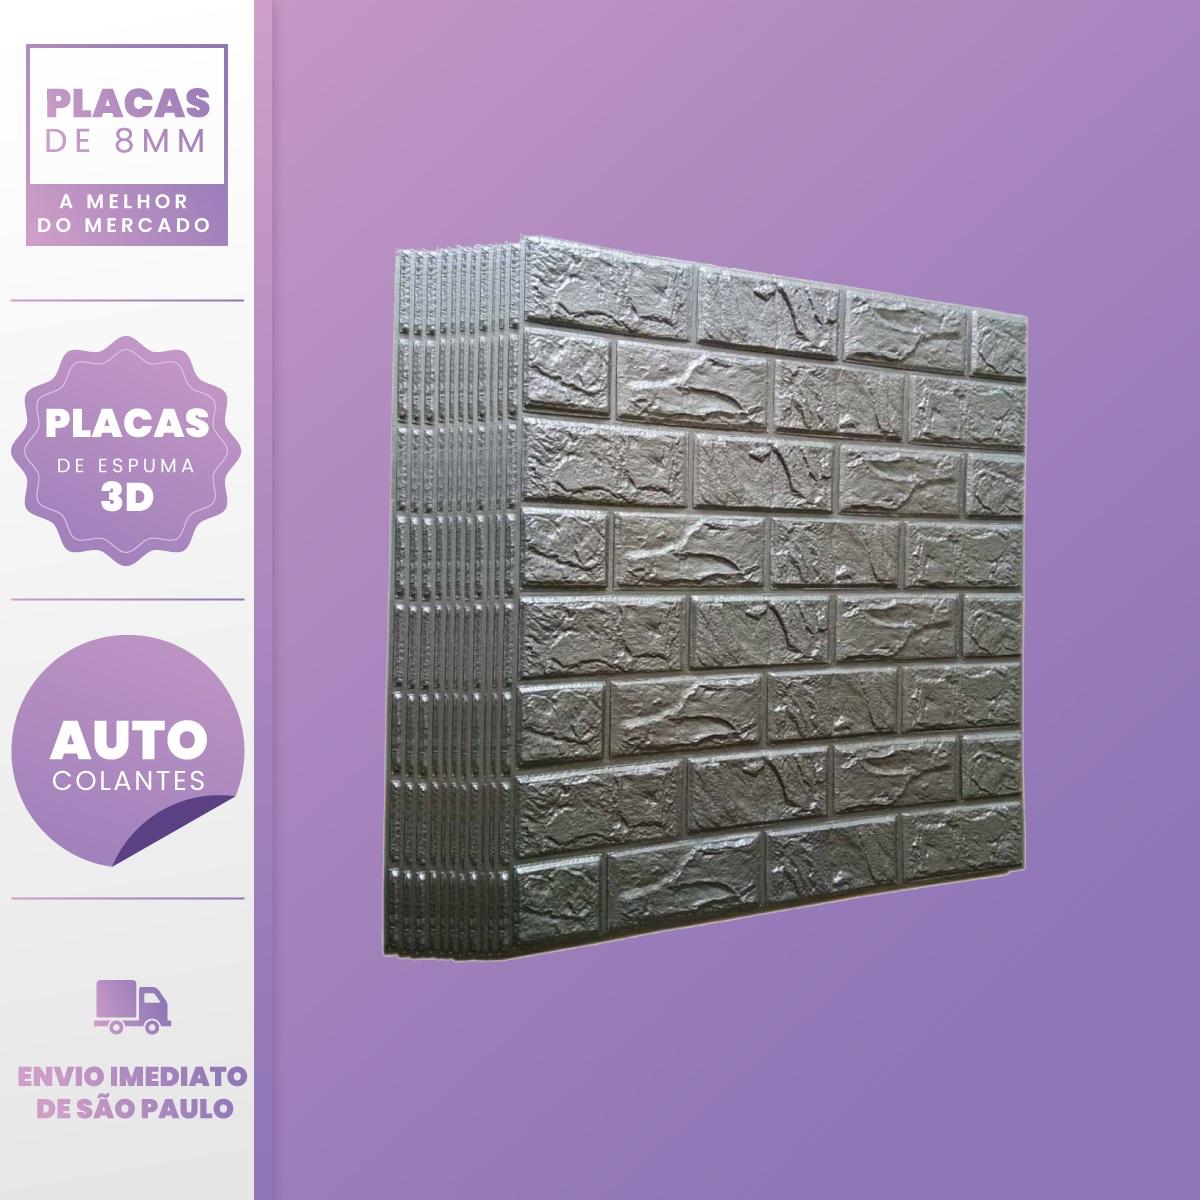 PLACA 3D ESPUMA TIJOLO CLASSICO CINZA 70X77 8MM